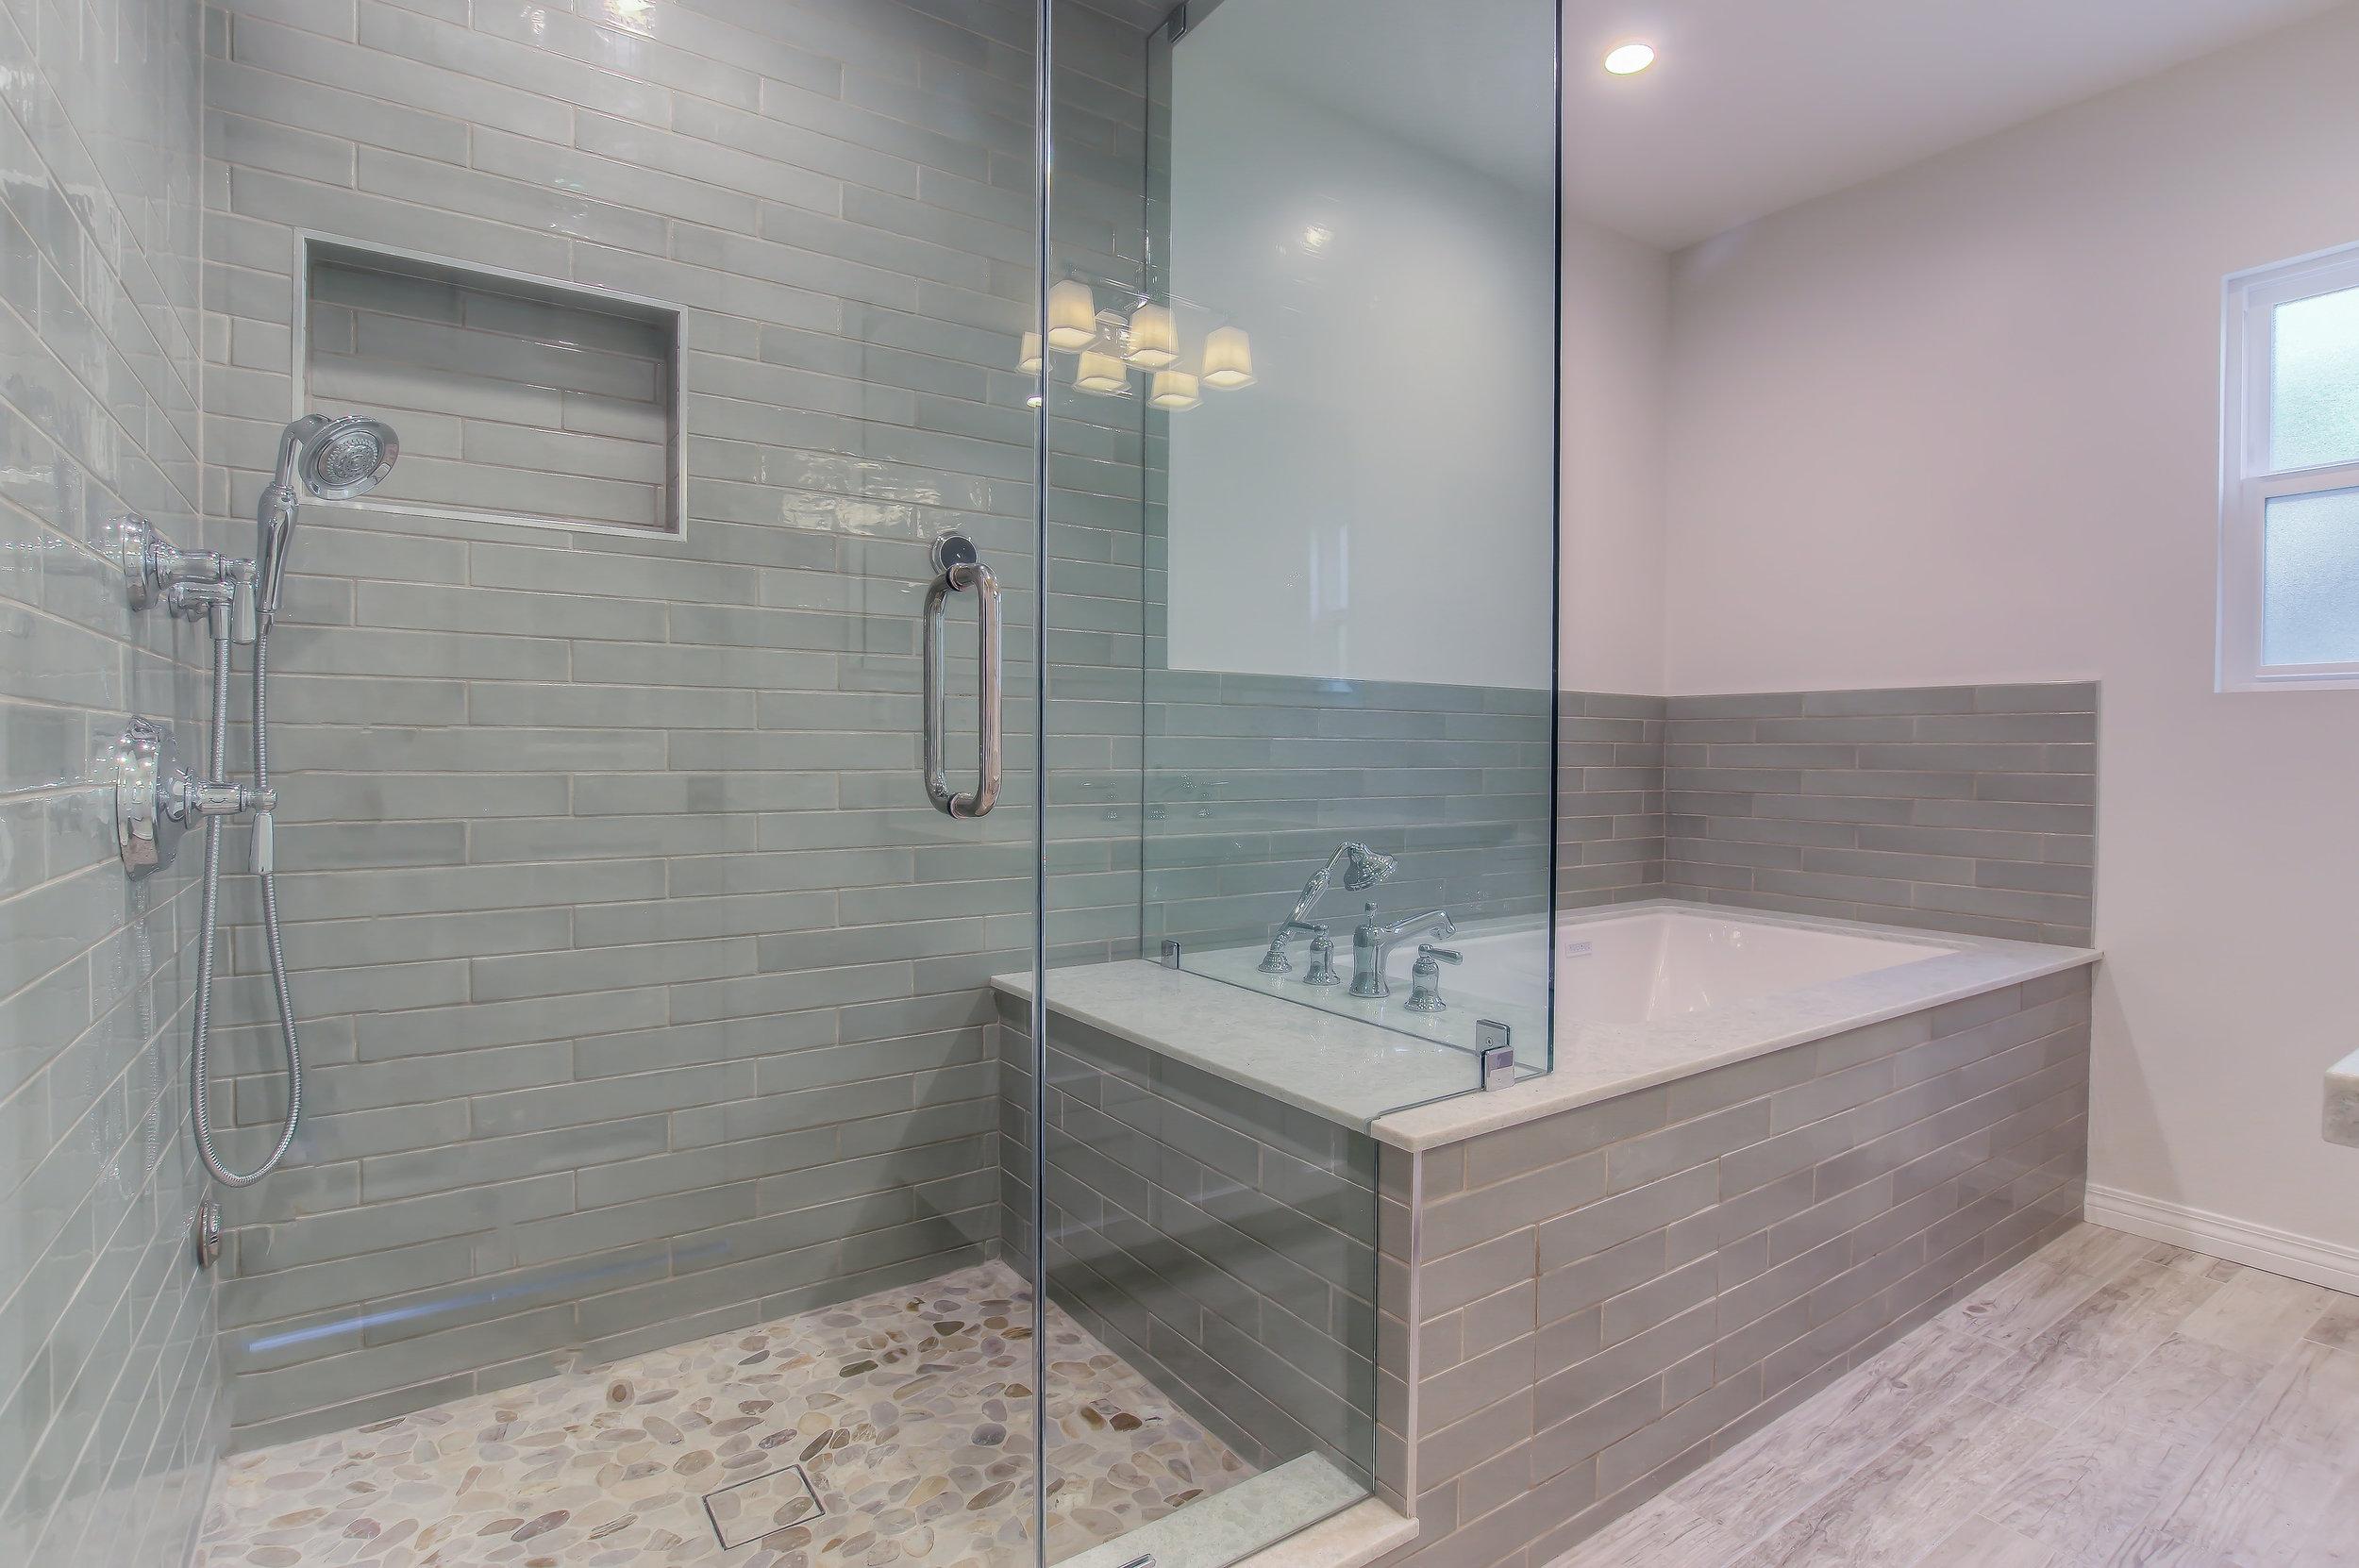 Complete bathroom remodel in Burbank